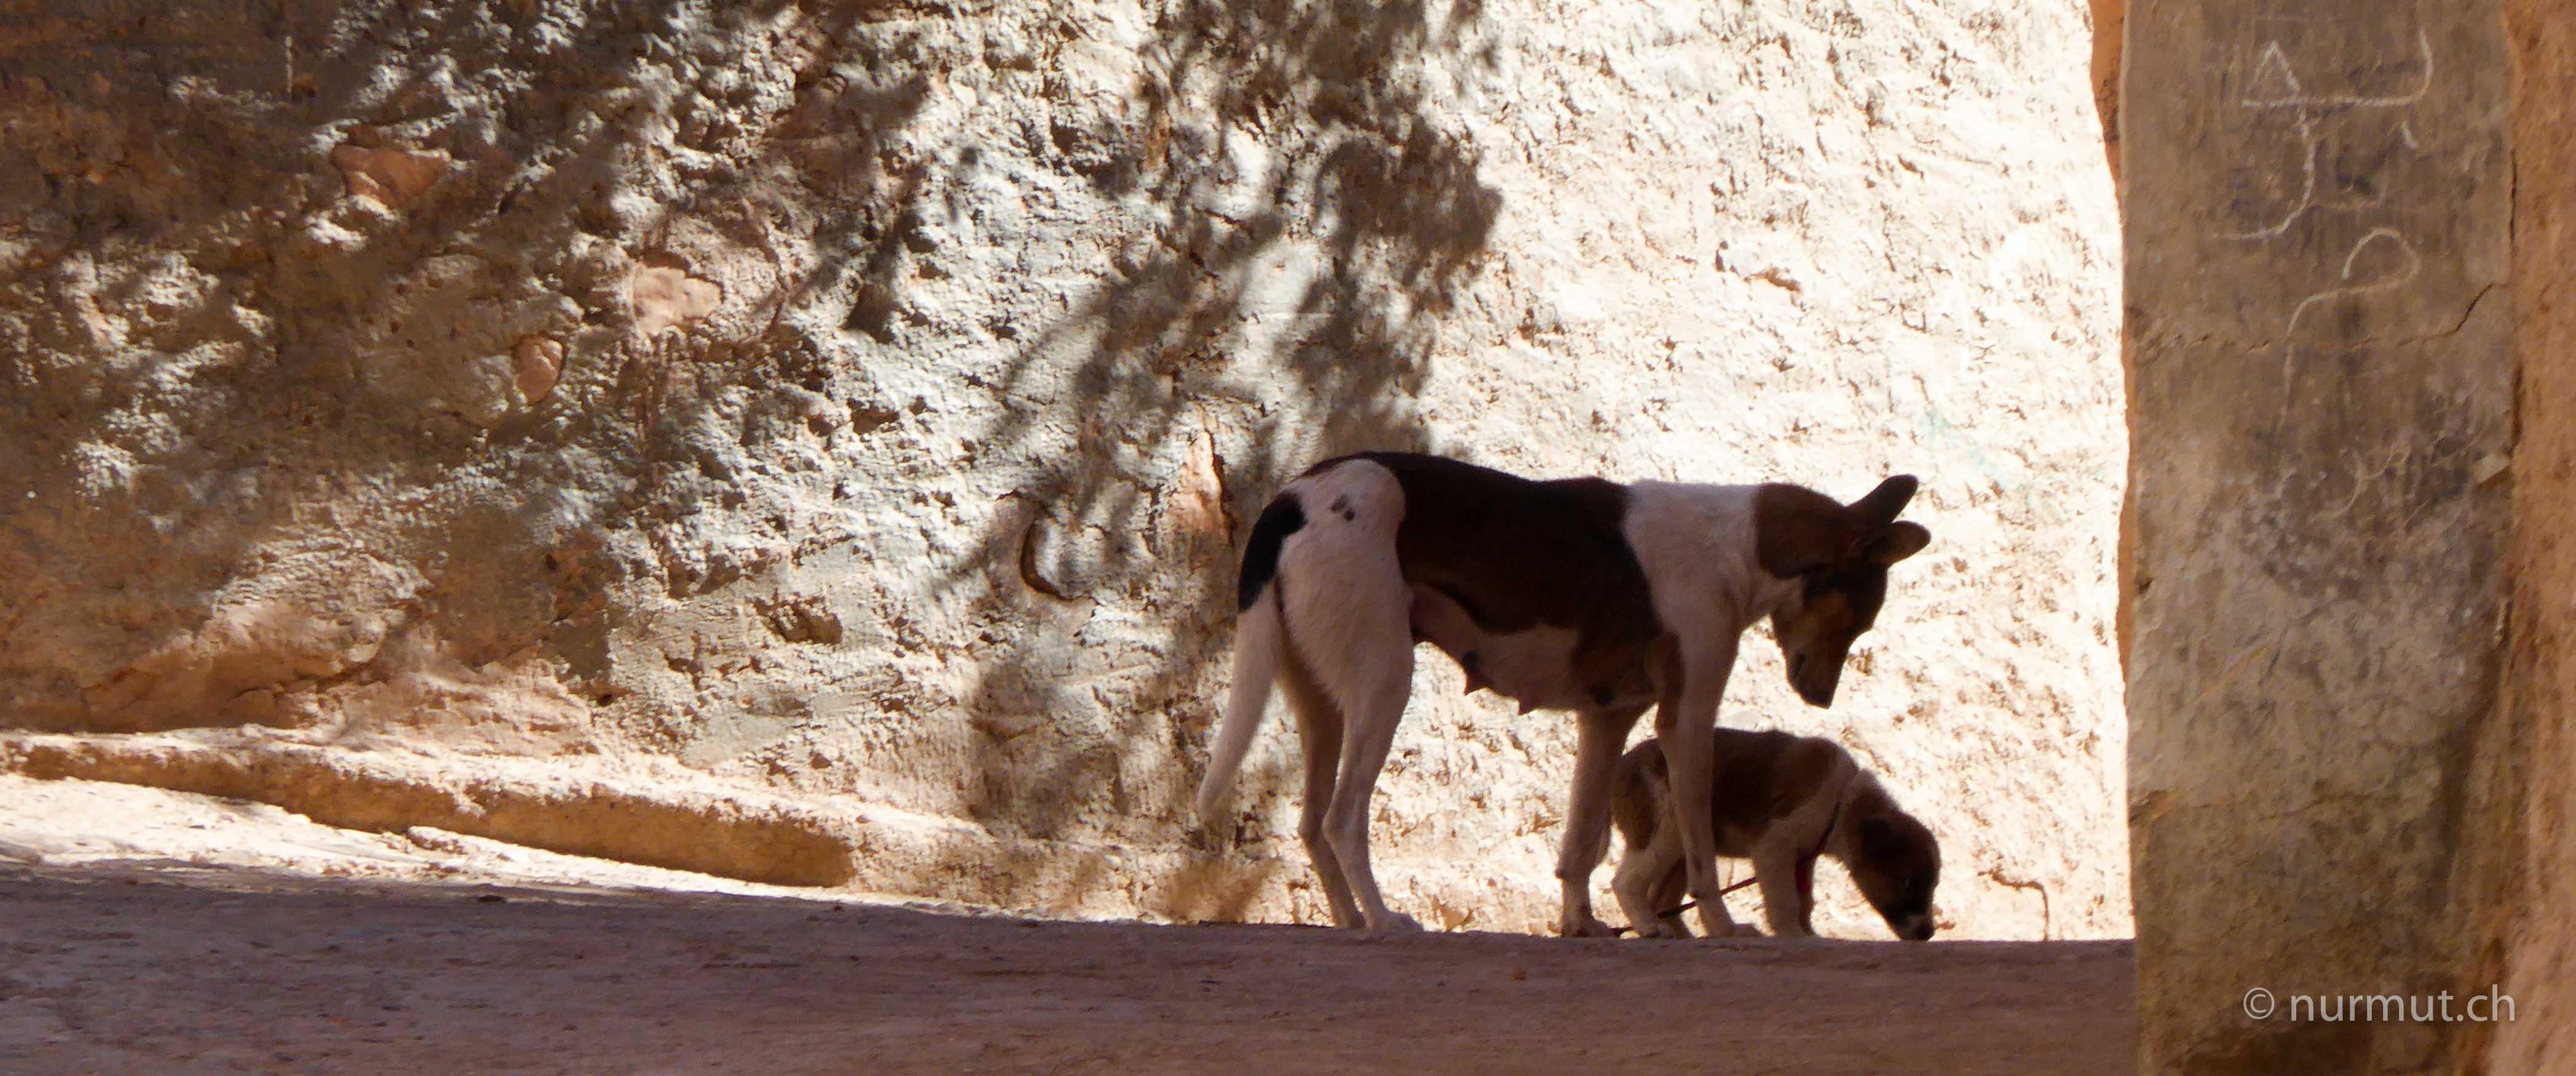 marokkoreise mit hund-marokko mit hund-marokko-infos marokko mit hund- wilde hunde in marokko-nurmut